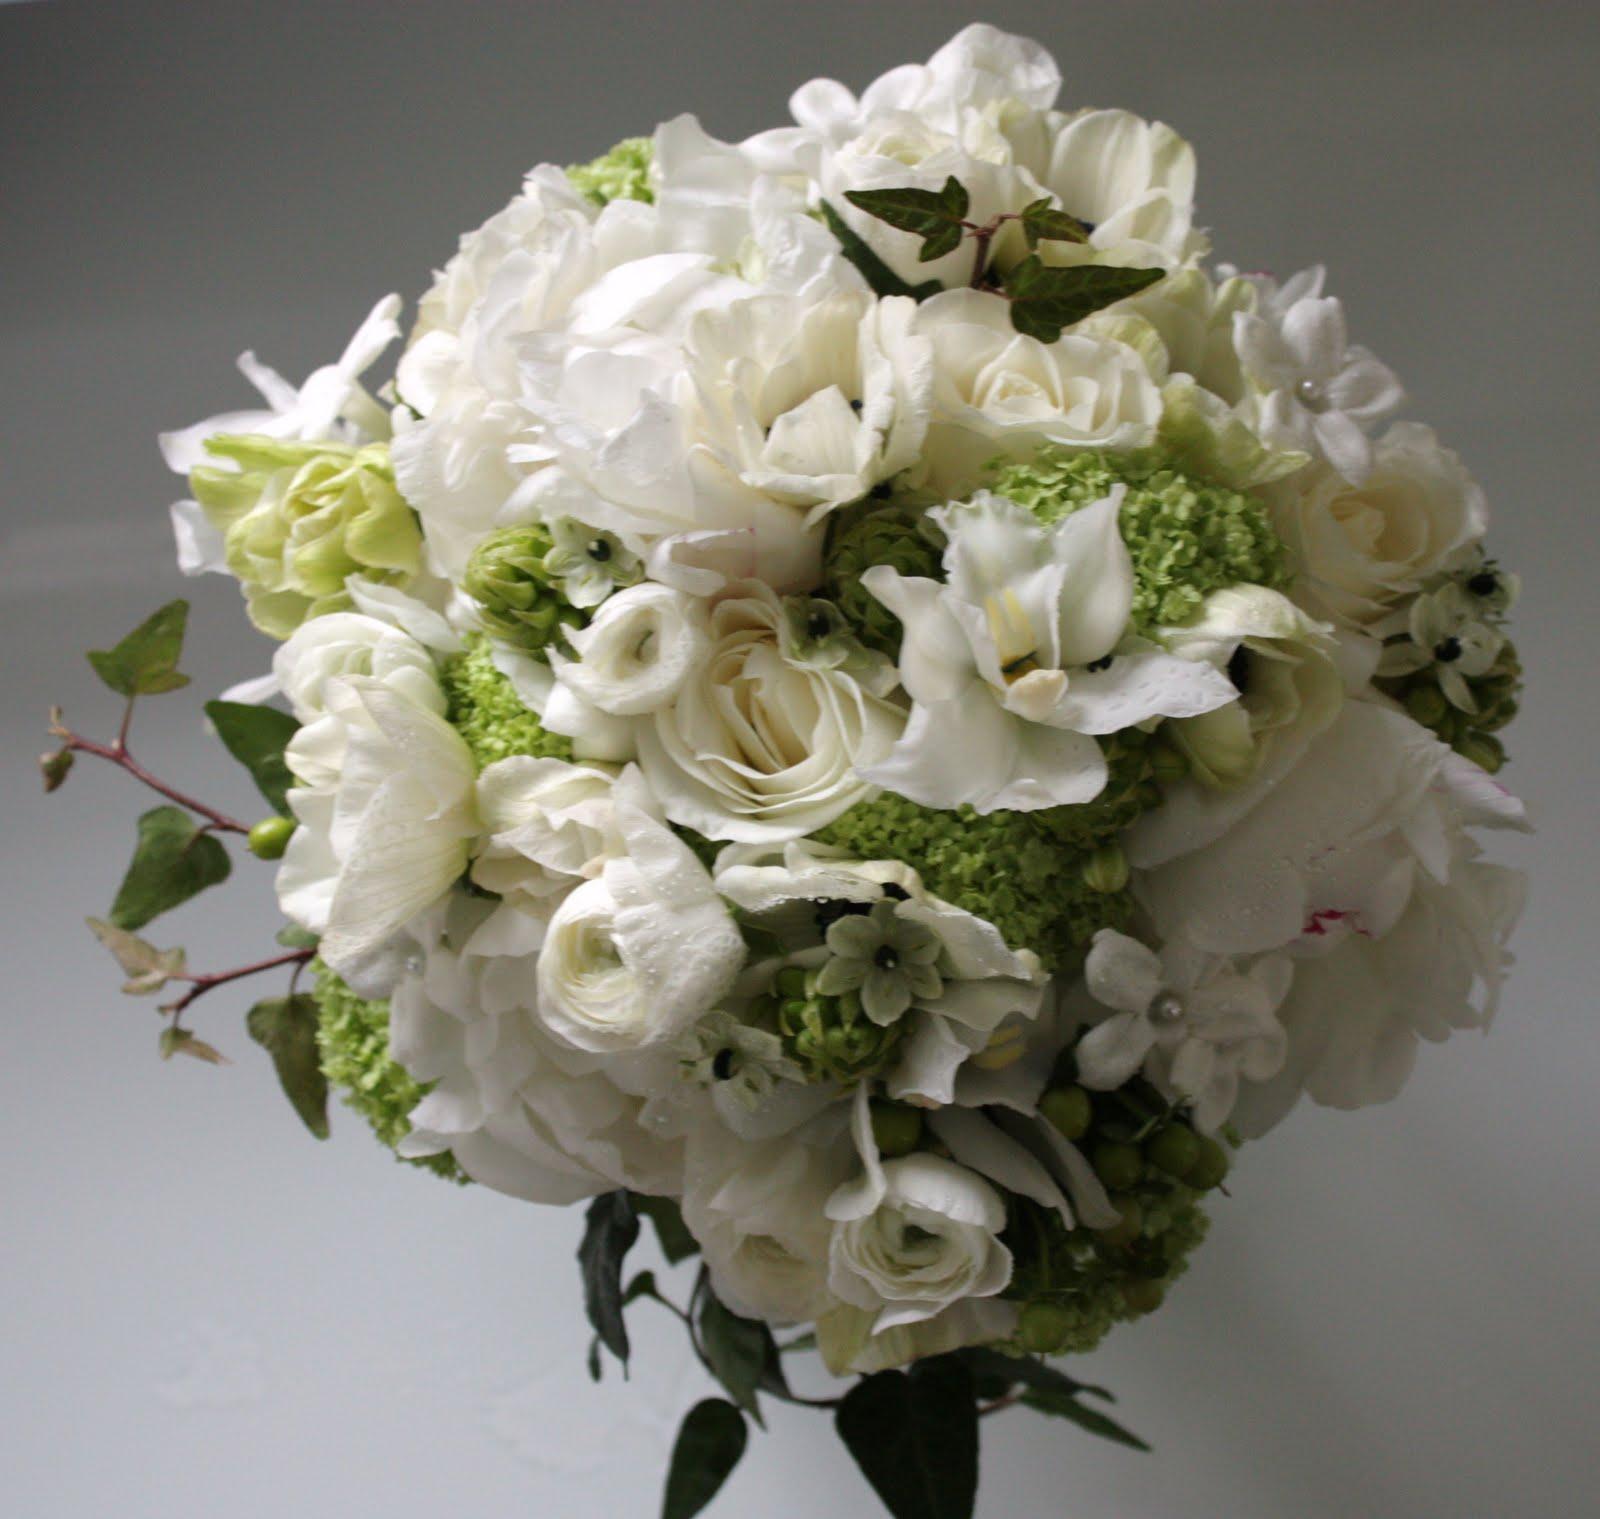 BLUSH Floral Design: White Wedding